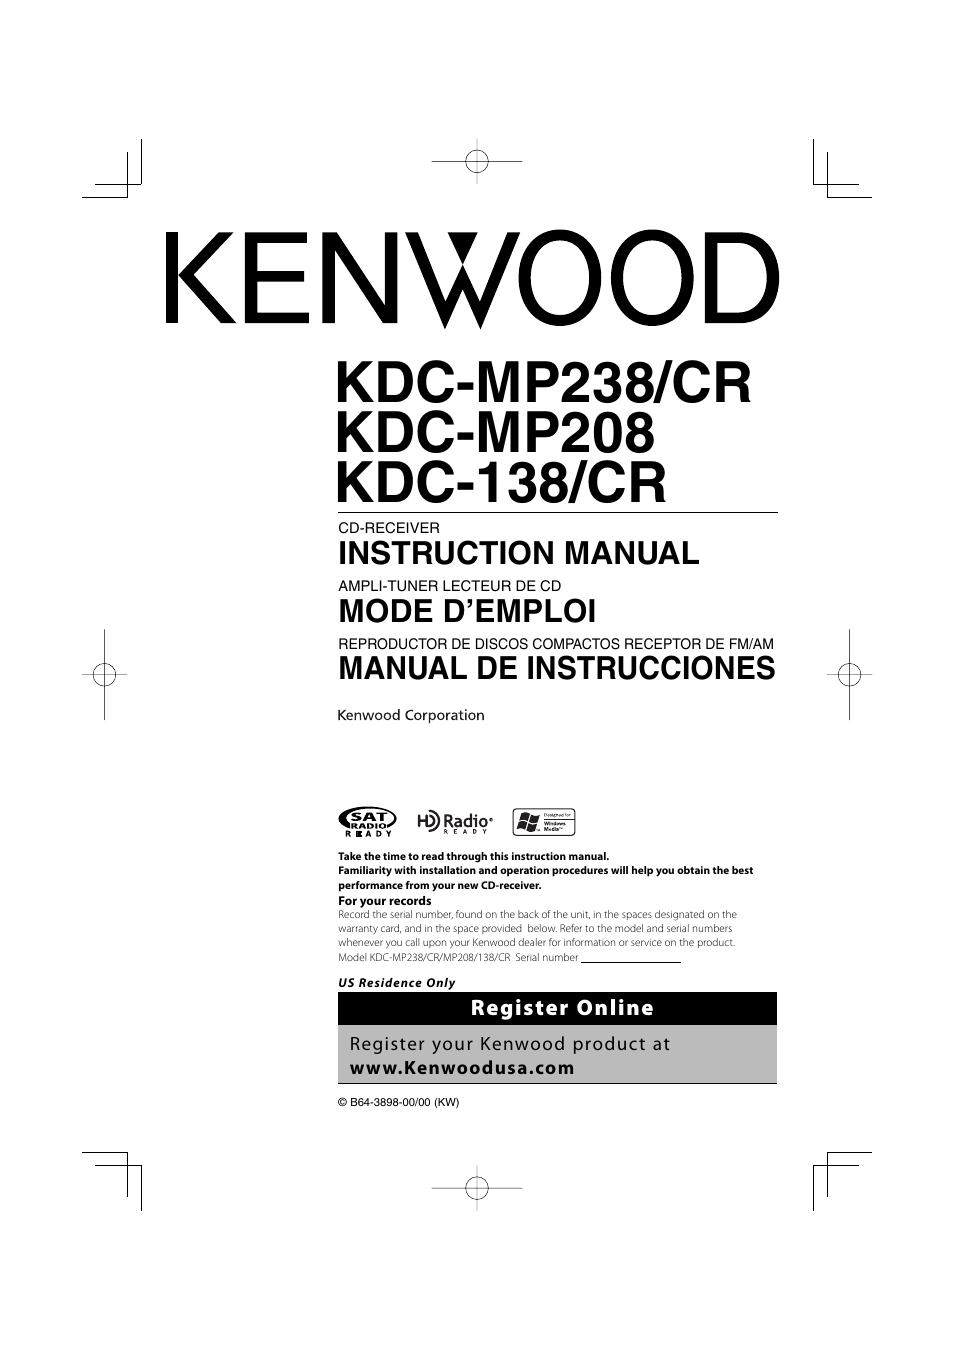 kenwood kdc 138 user manual 56 pages also for kdc 138cr kdc rh manualsdir com Kenwood Wiring-Diagram Kenwood MP238 Manual